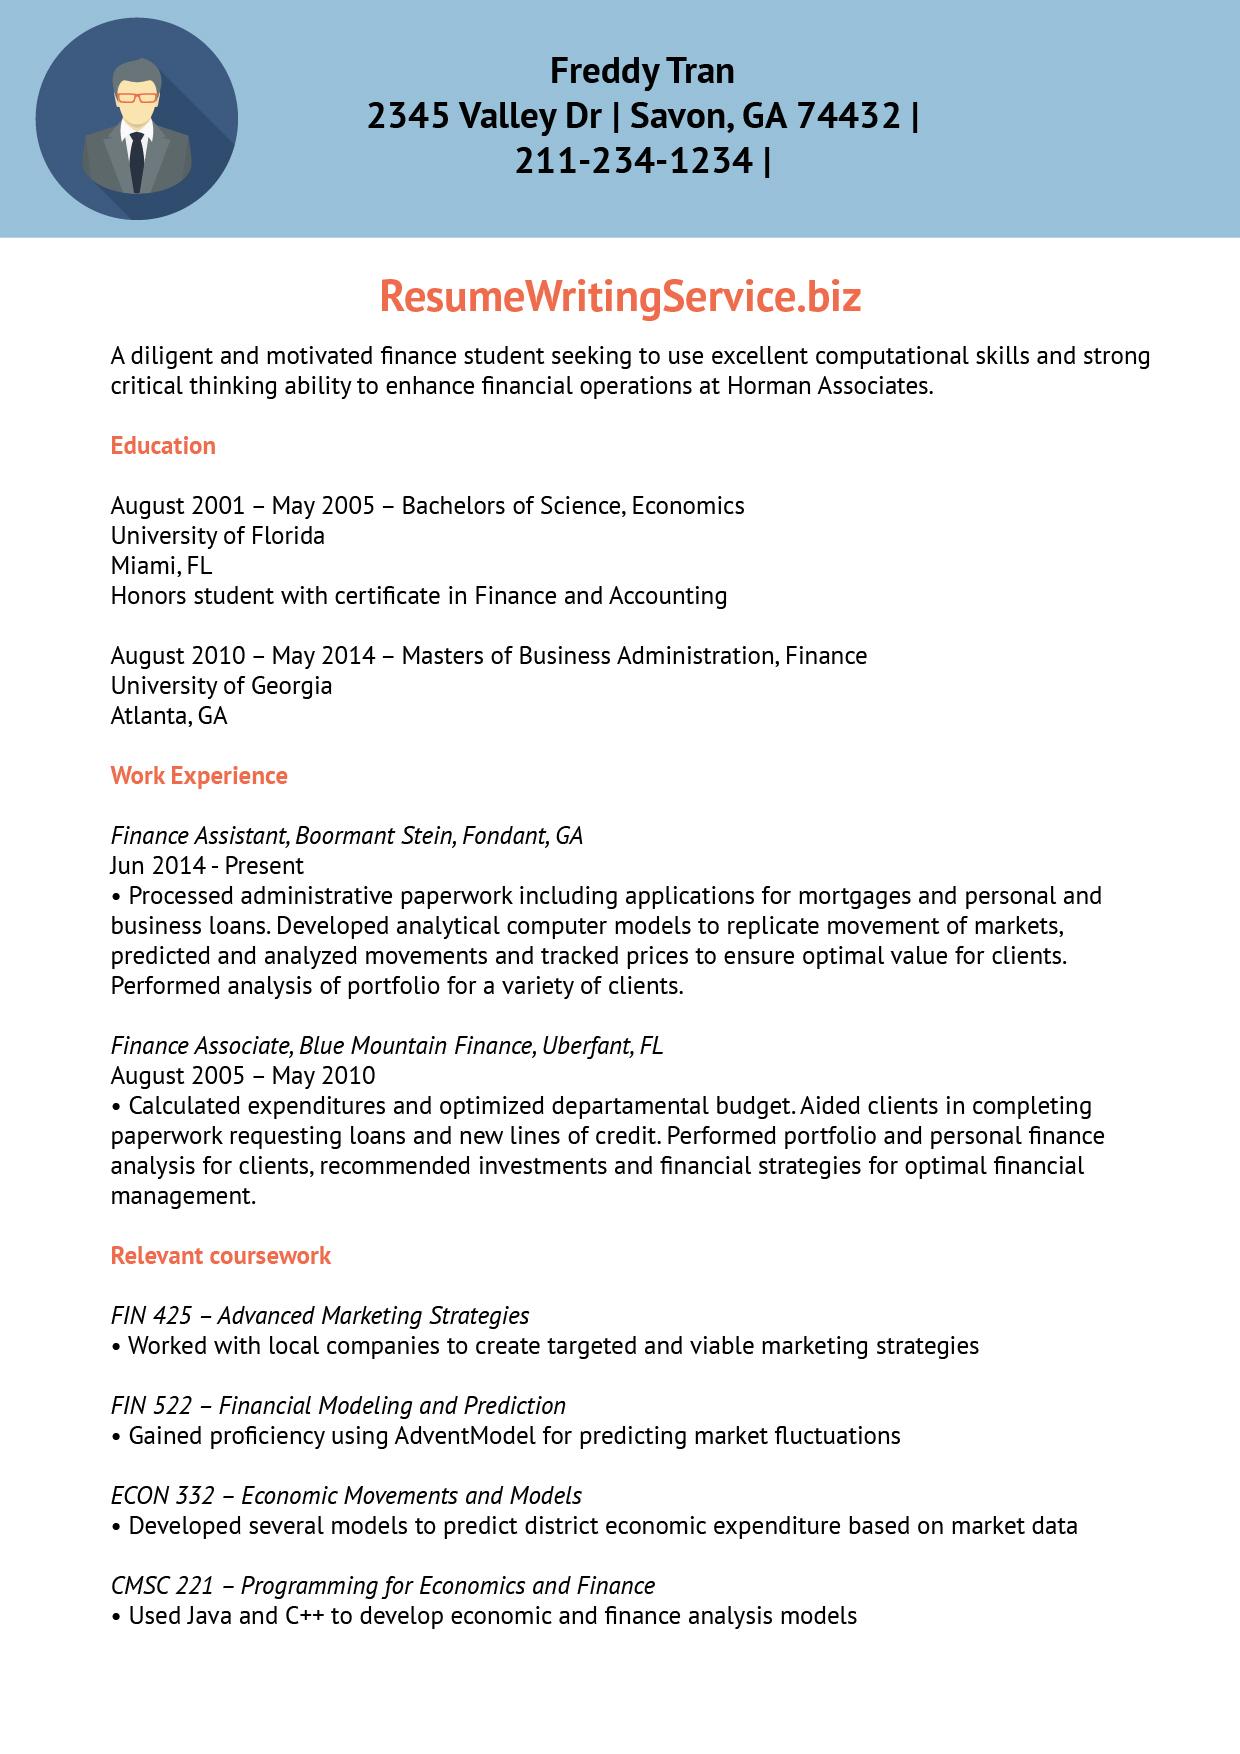 Finance Trainee Resume Sample